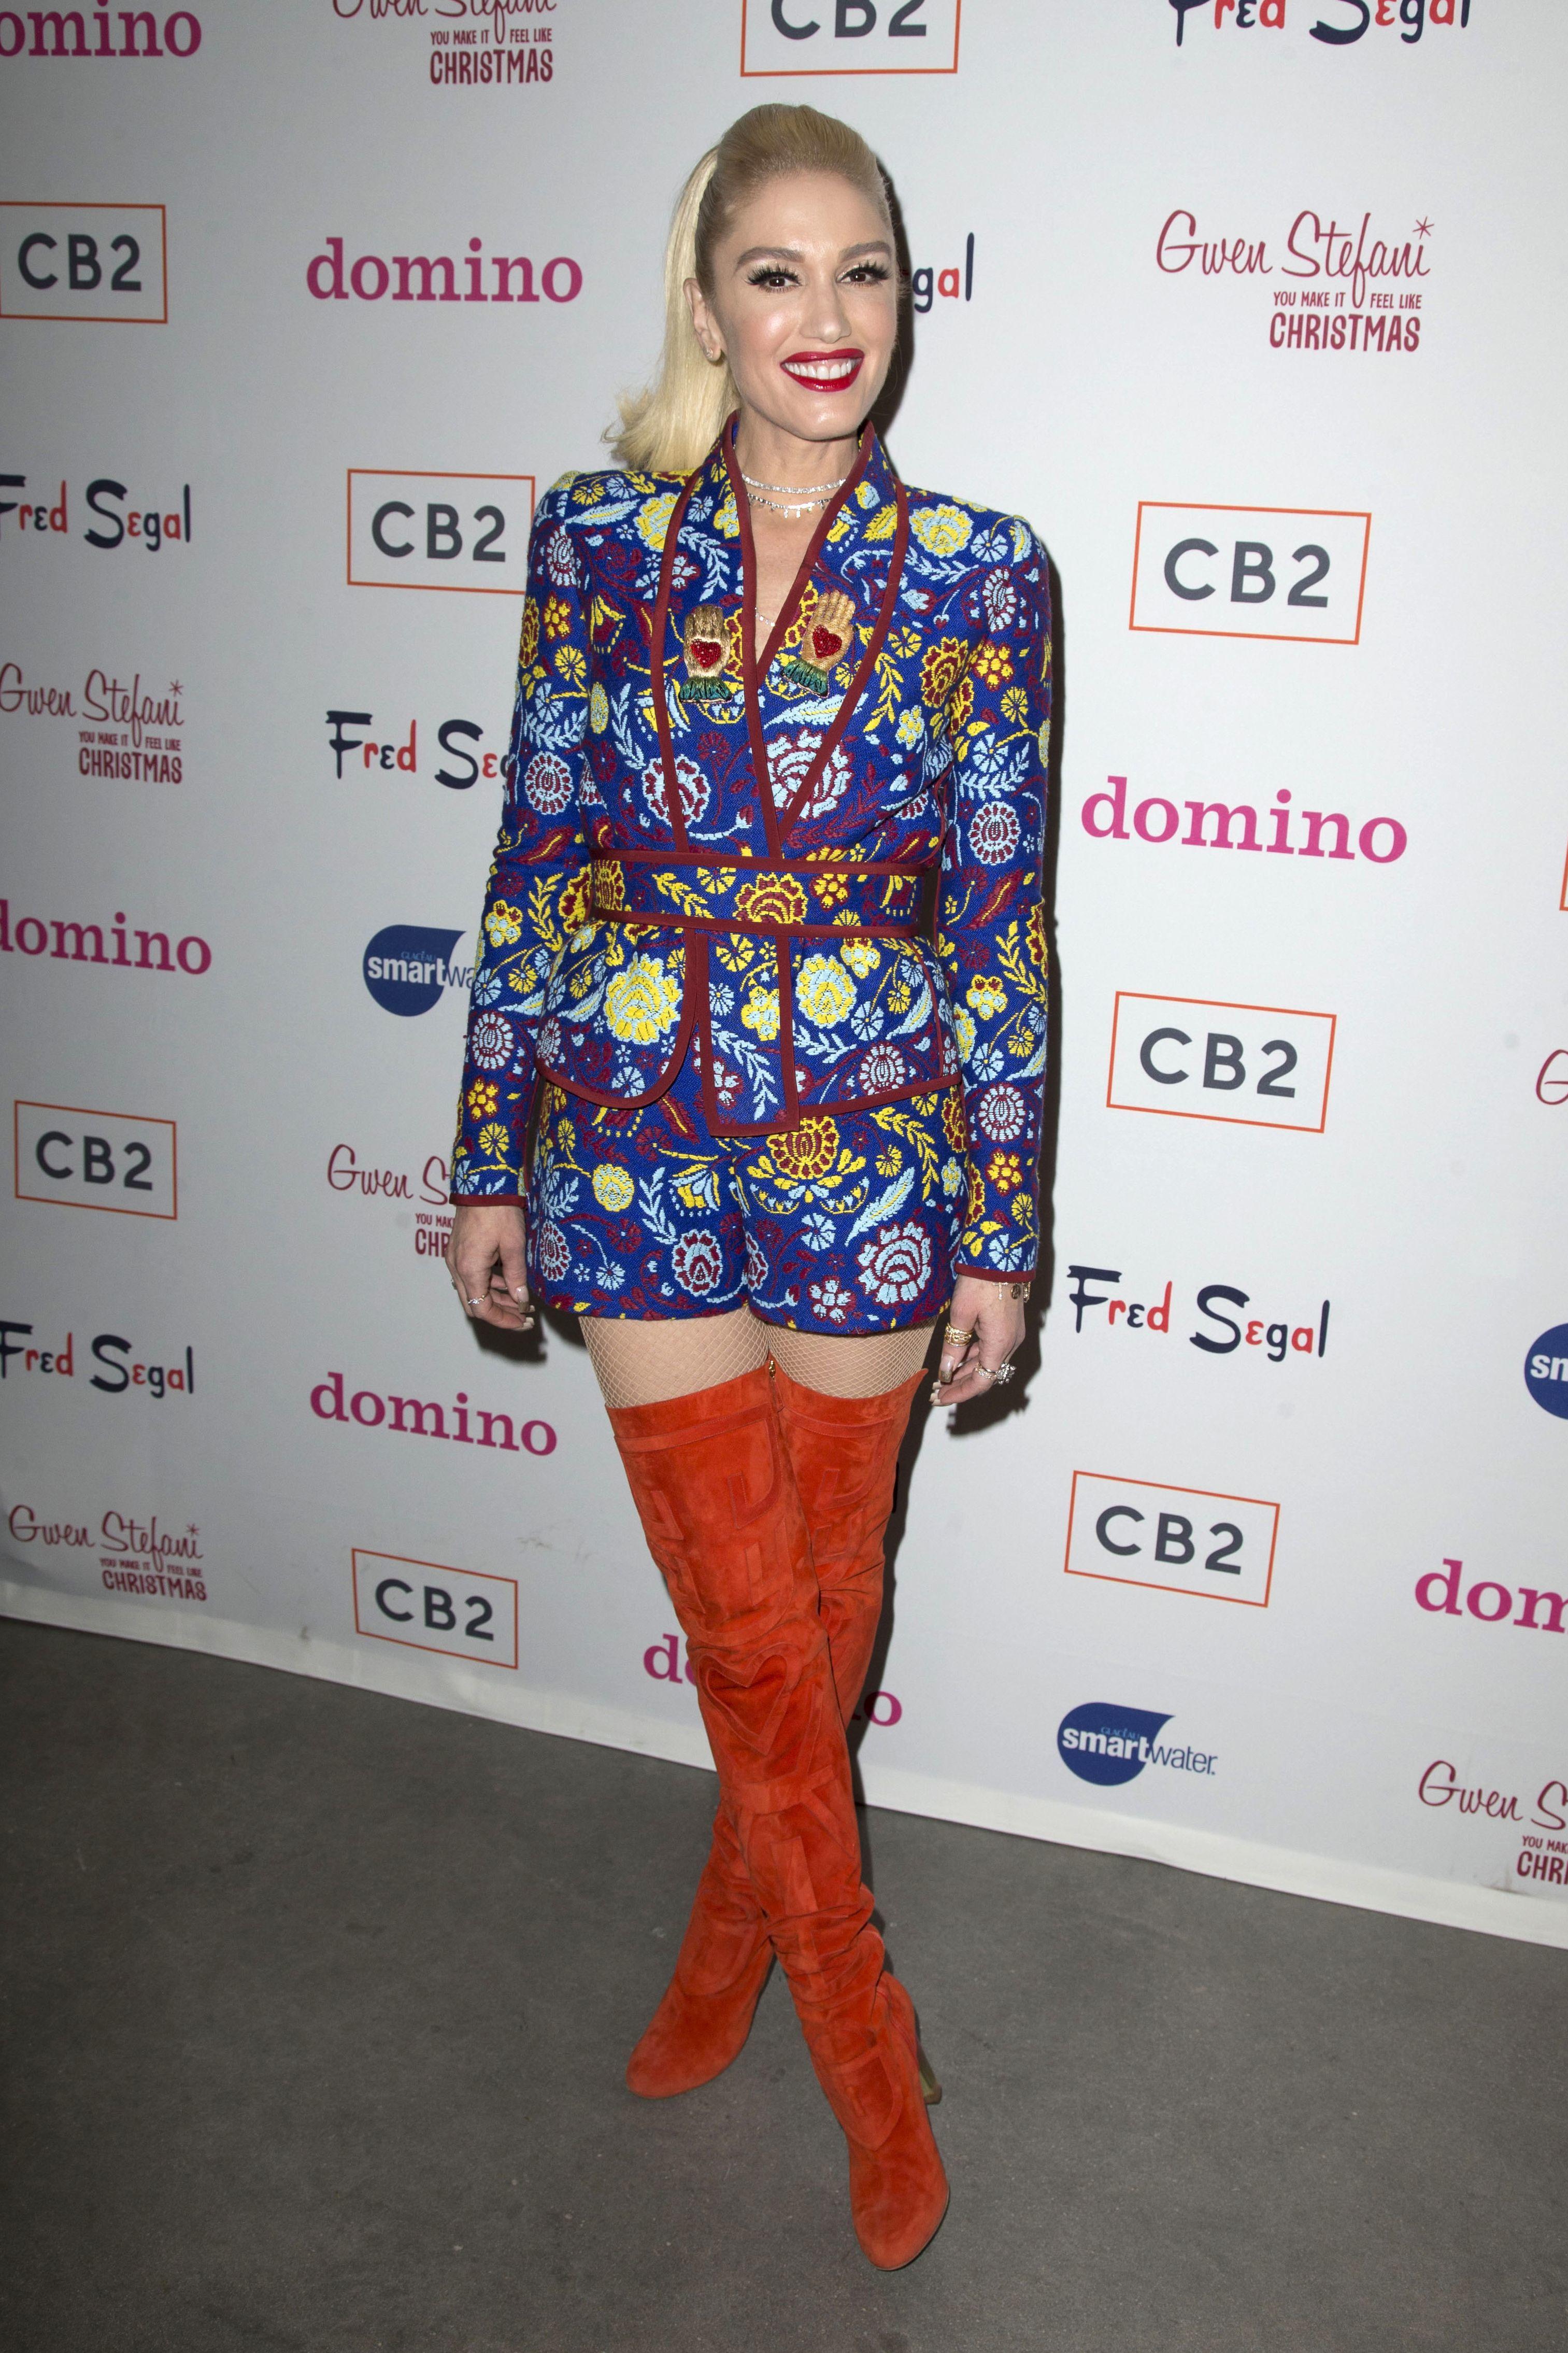 Gwen Stefani Week In Celebrity Pictures Dec 4 8